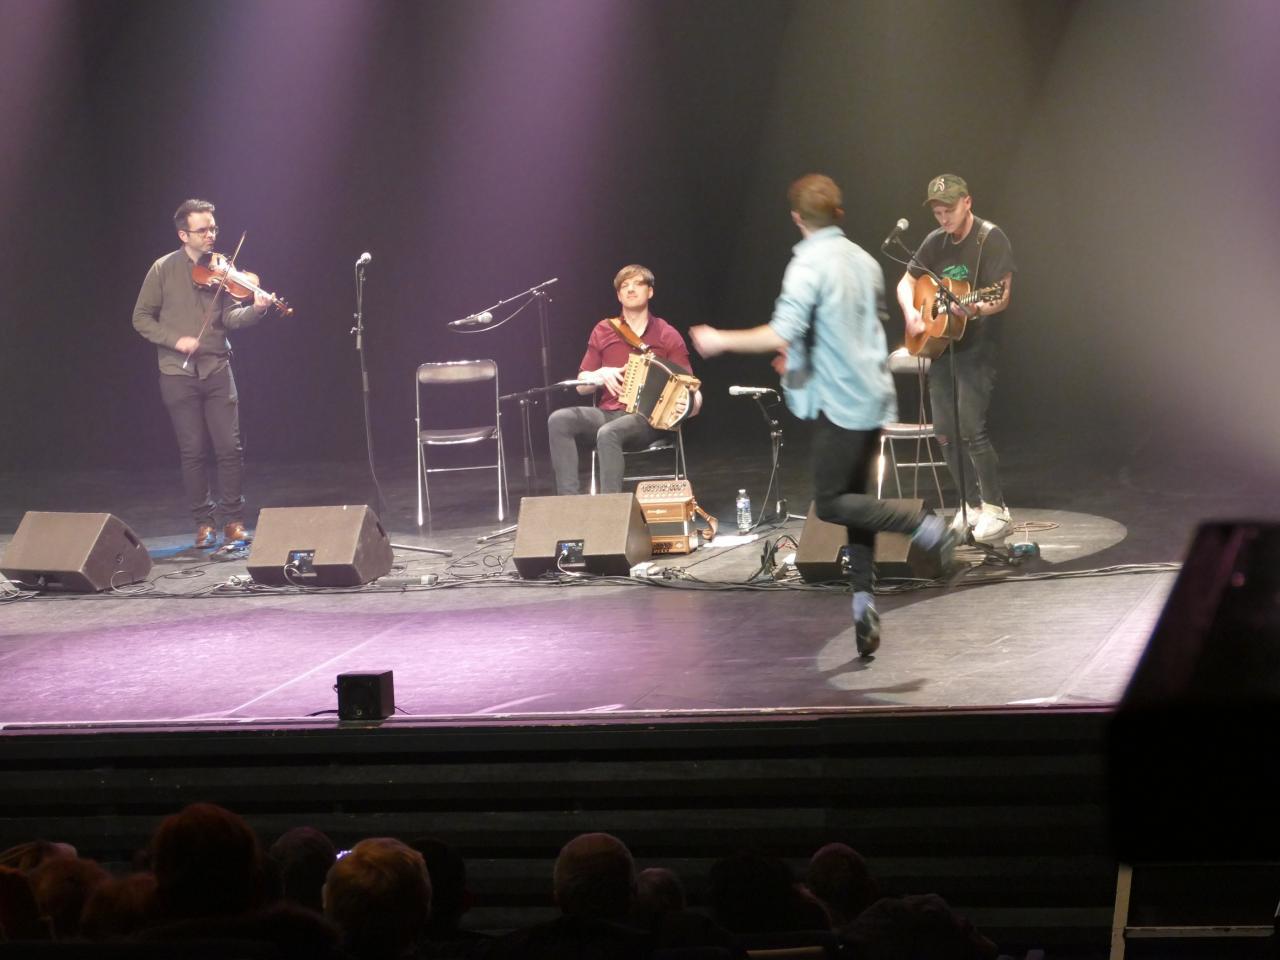 Lens 18 mars 2018 - Damien Mullane Band